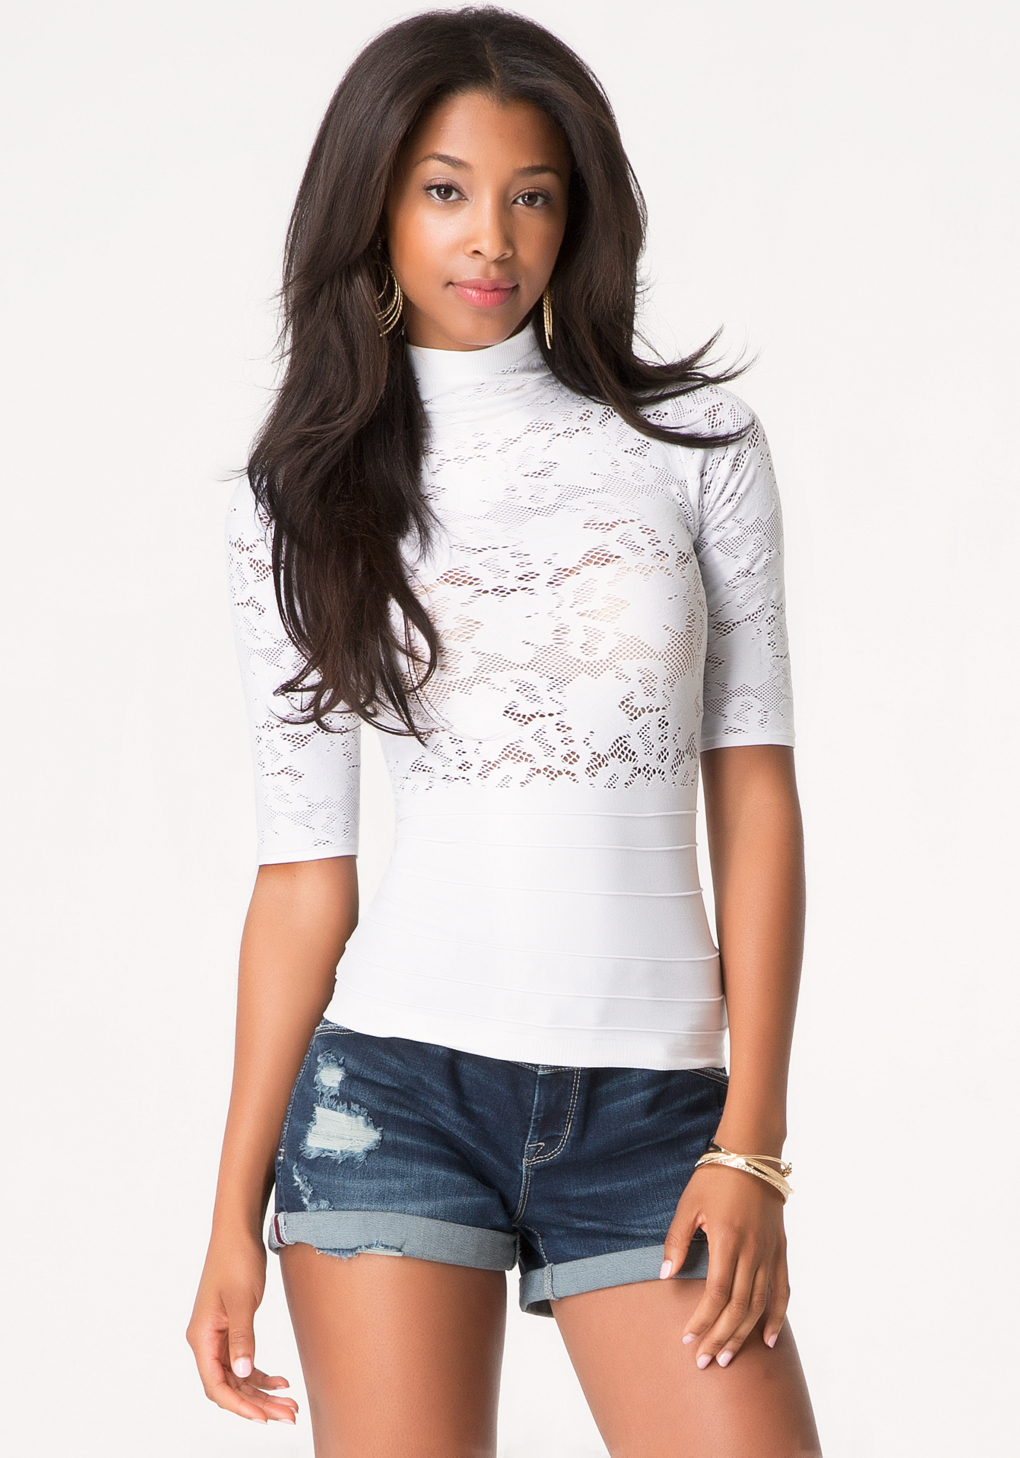 White Crew Neck T Shirt Women S